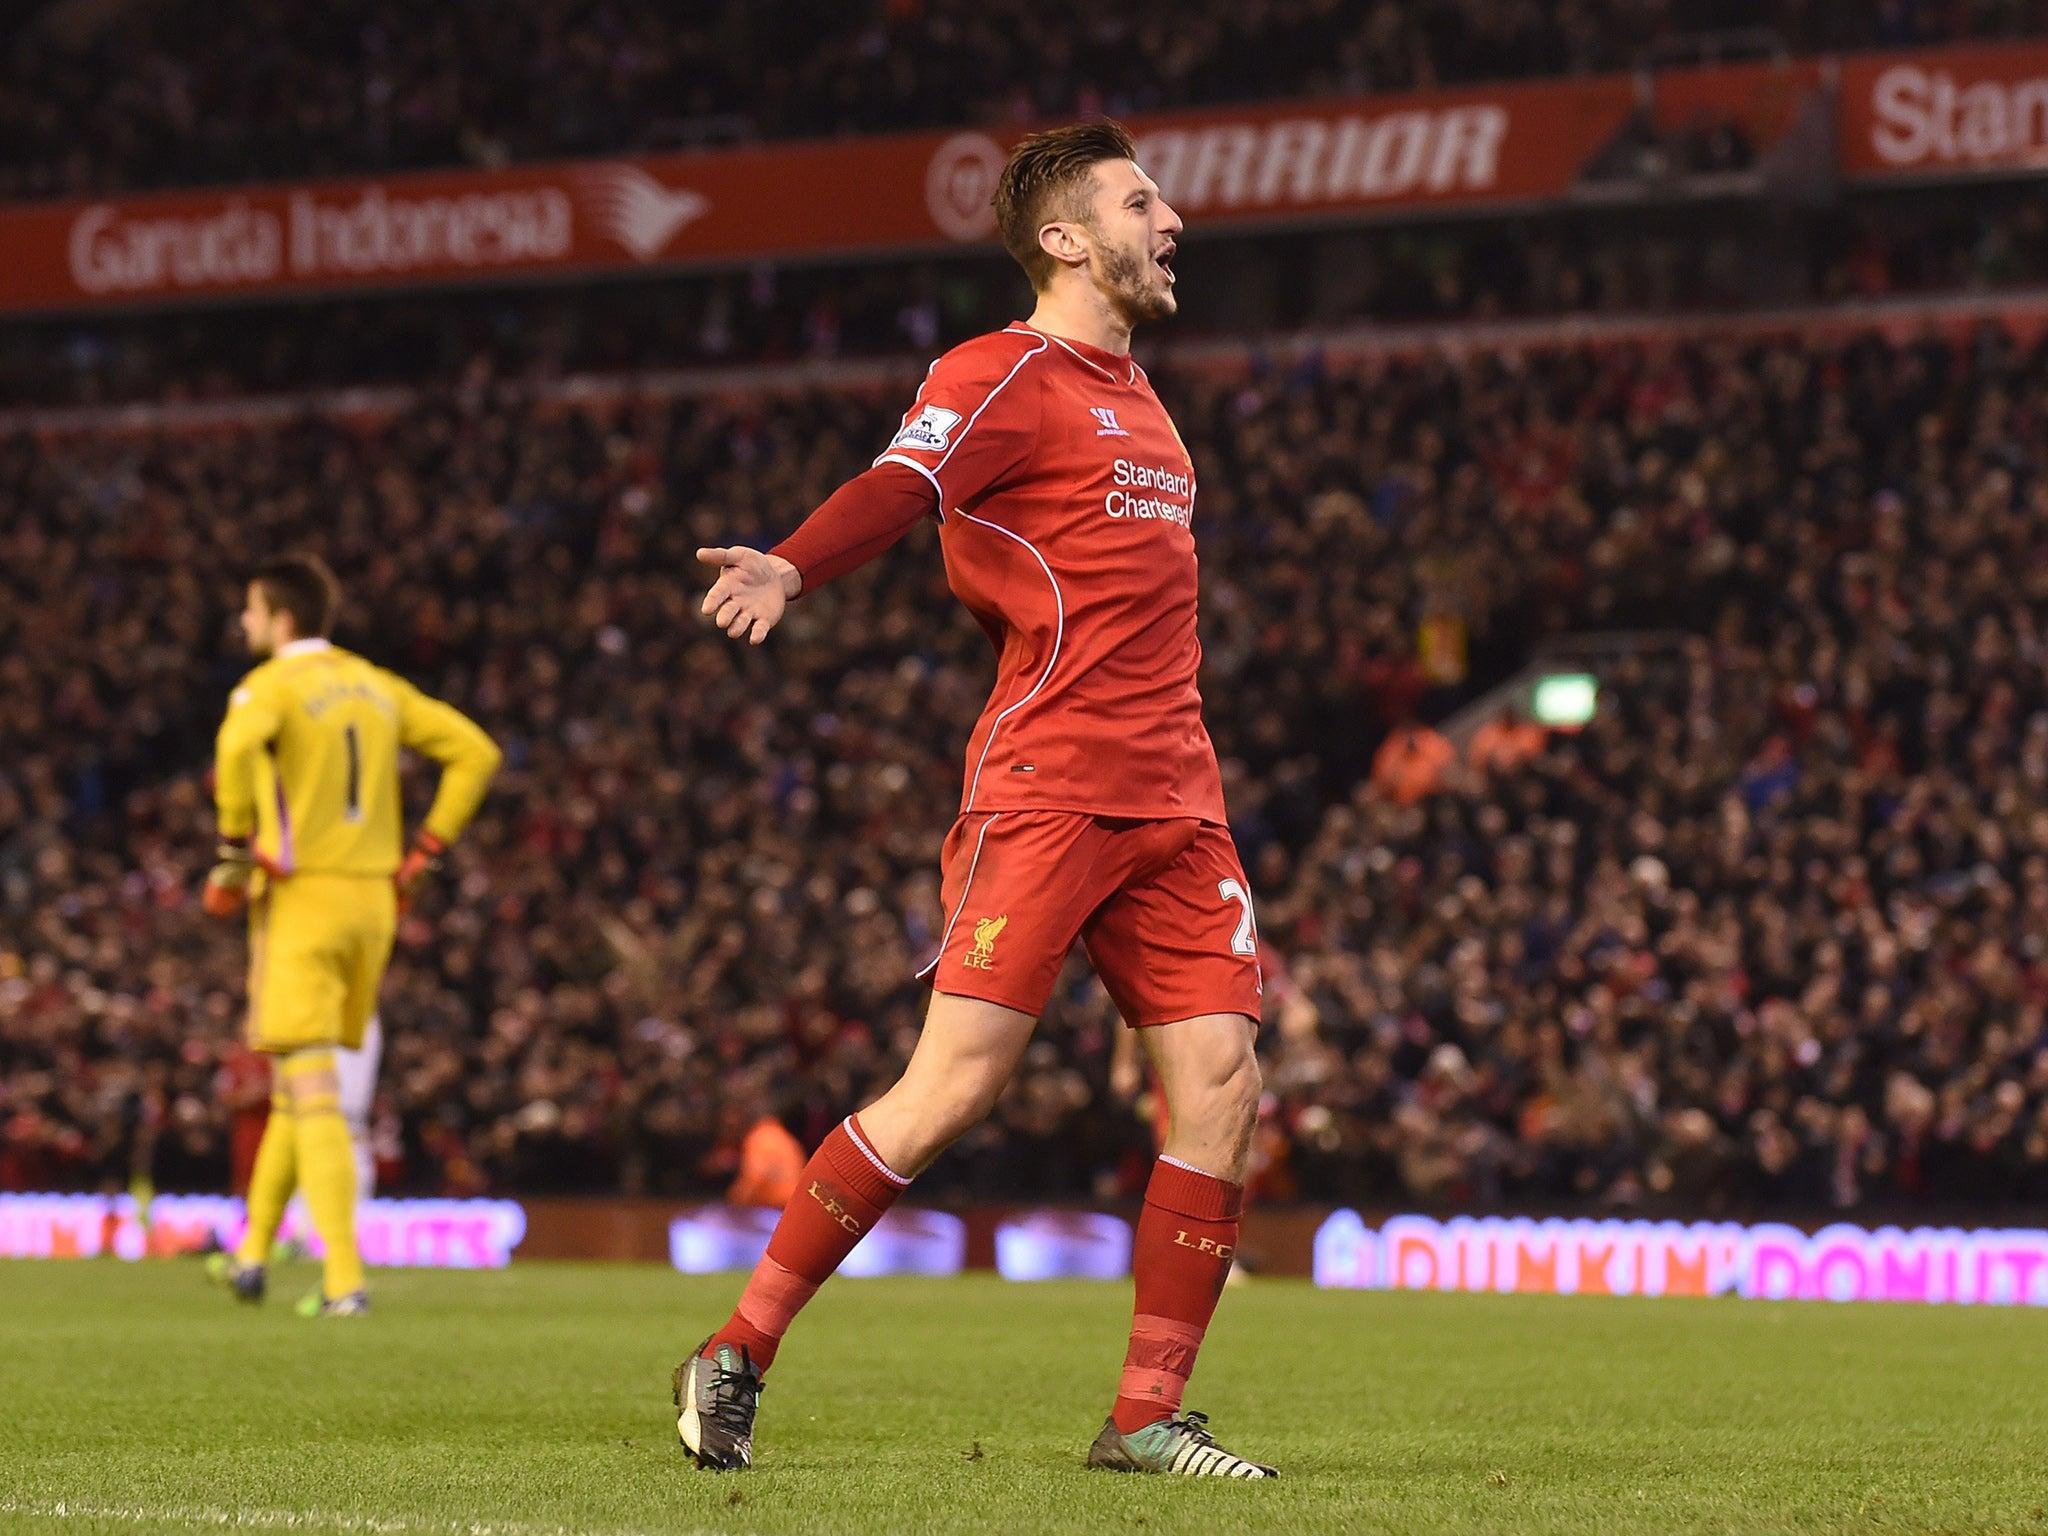 Liverpool Vs Swansea Player Ratings: Adam Lallana Among